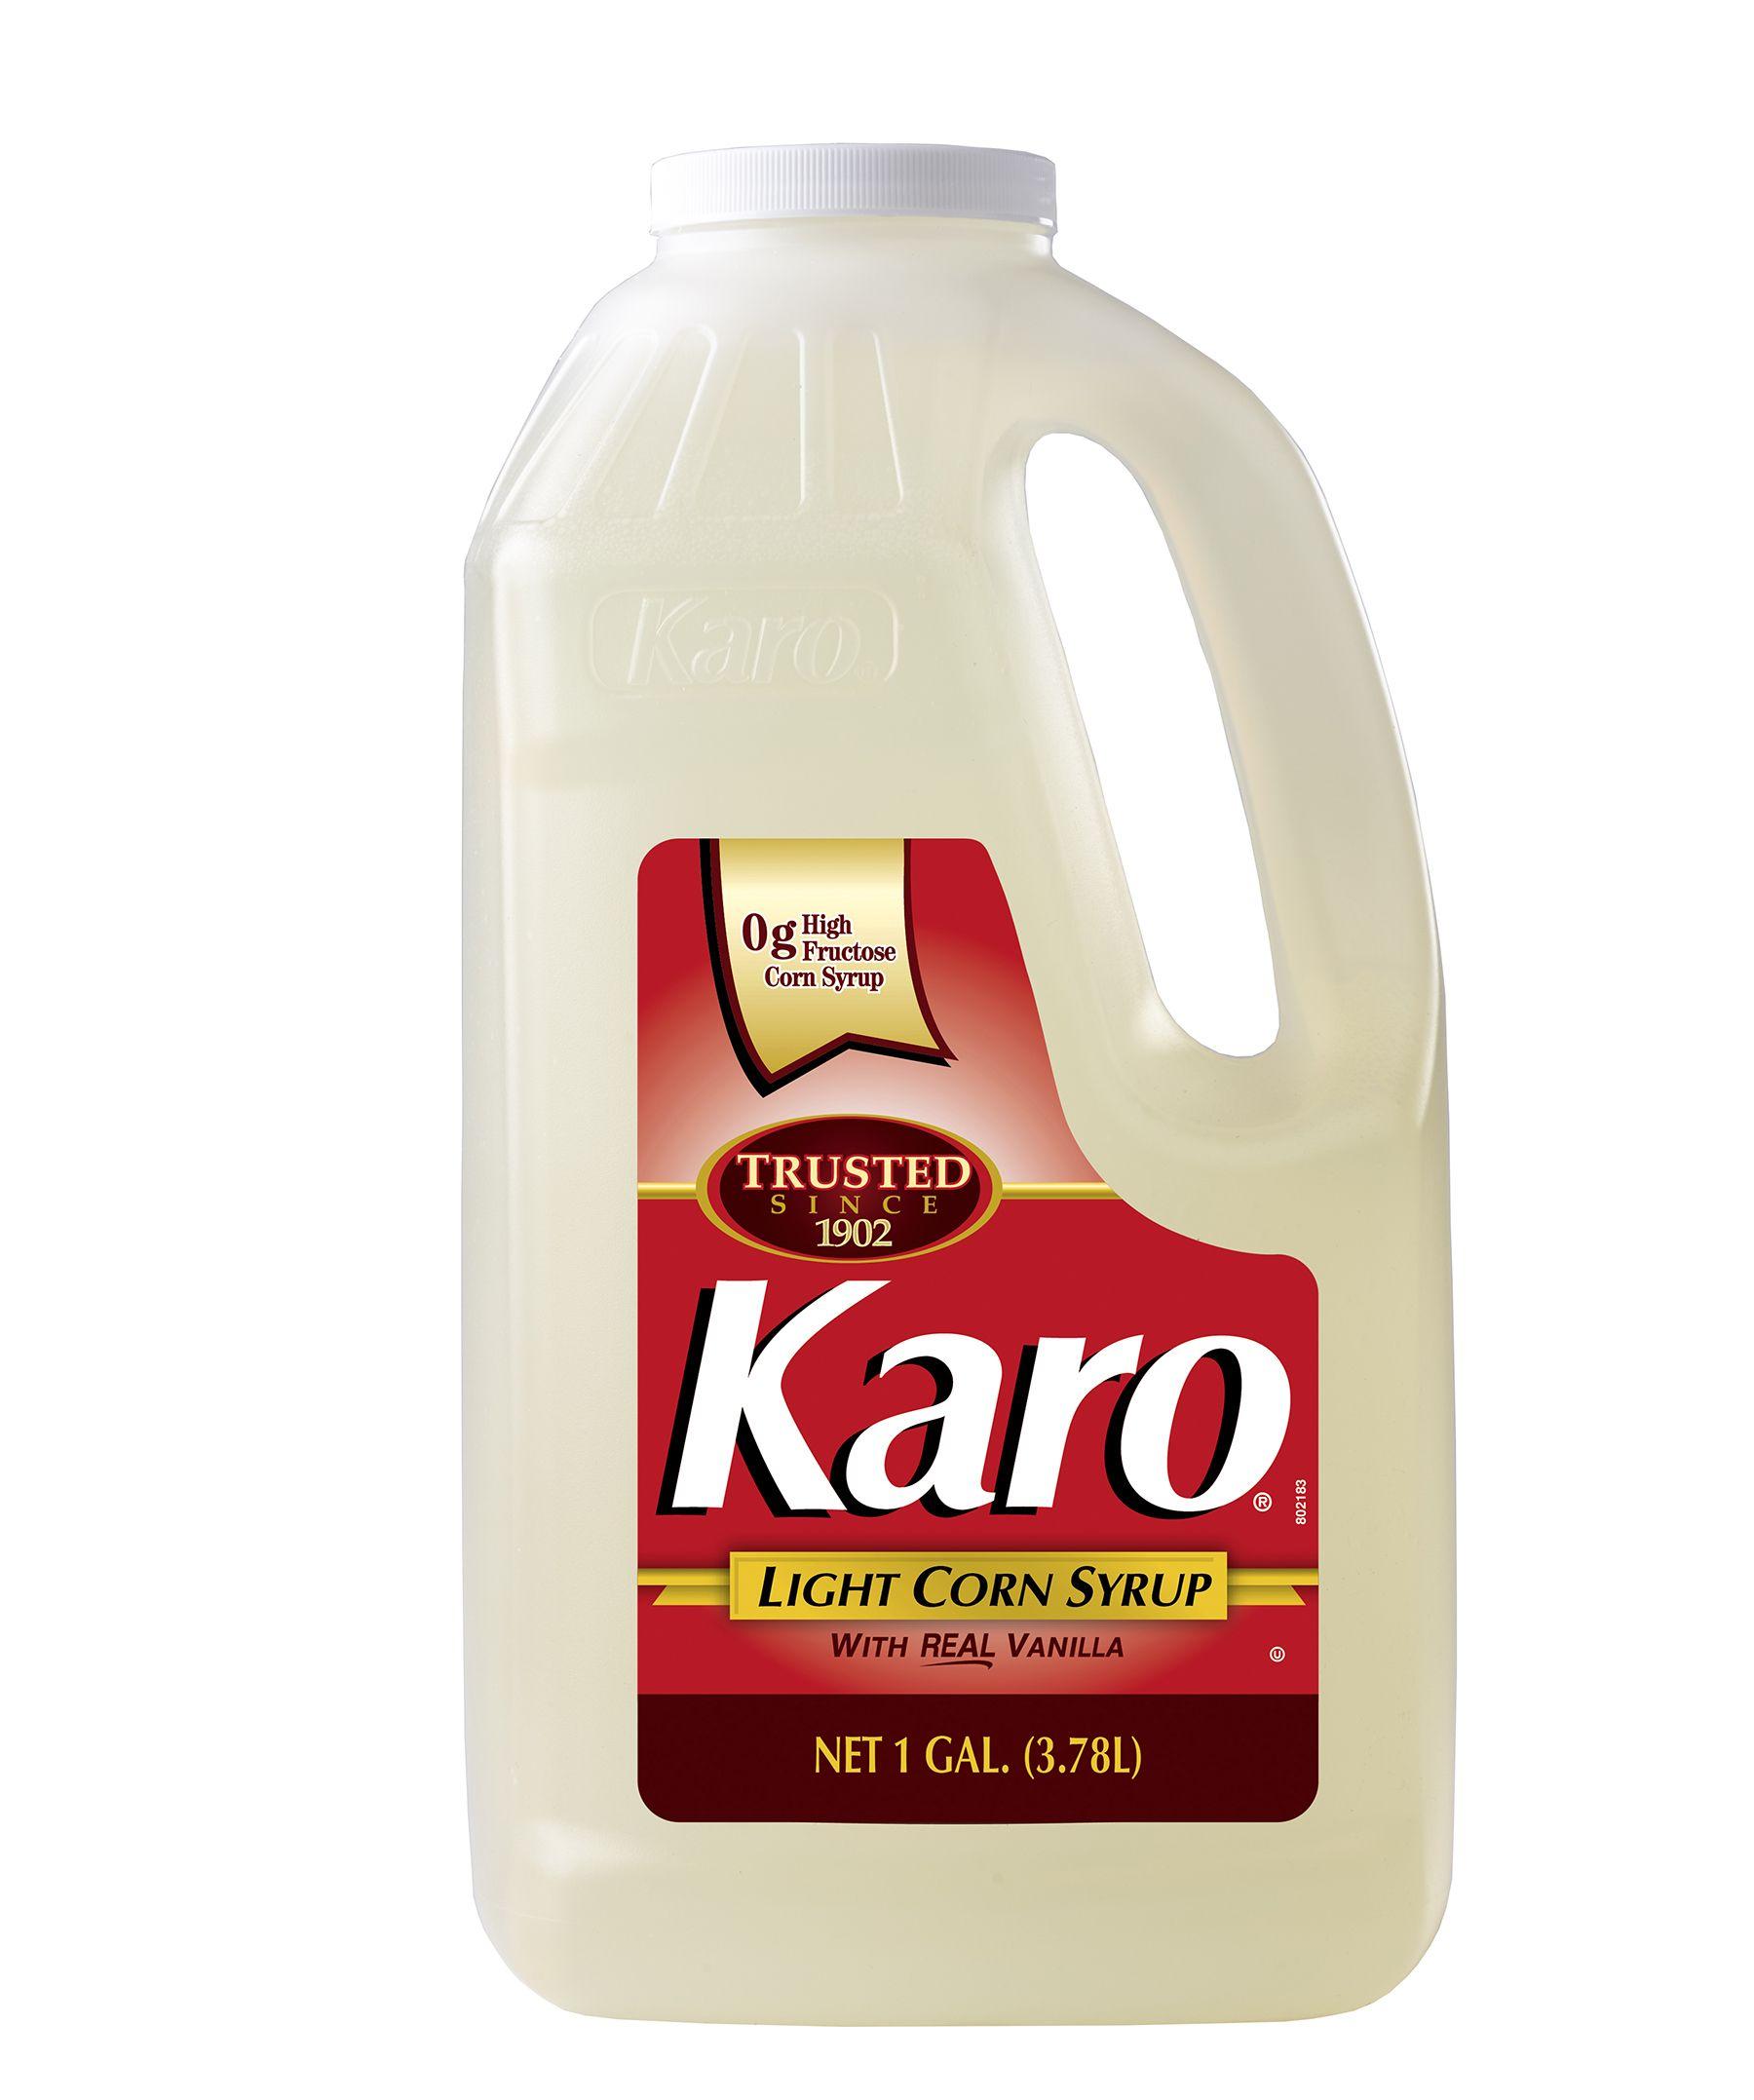 Karo Light Corn Syrup Ingredients Light Corn Syrup Salt Vanilla Whatsugar Karo Cornsyrup Corn Syrup Cream Of Potato Soup Campbell S Cream Of Chicken